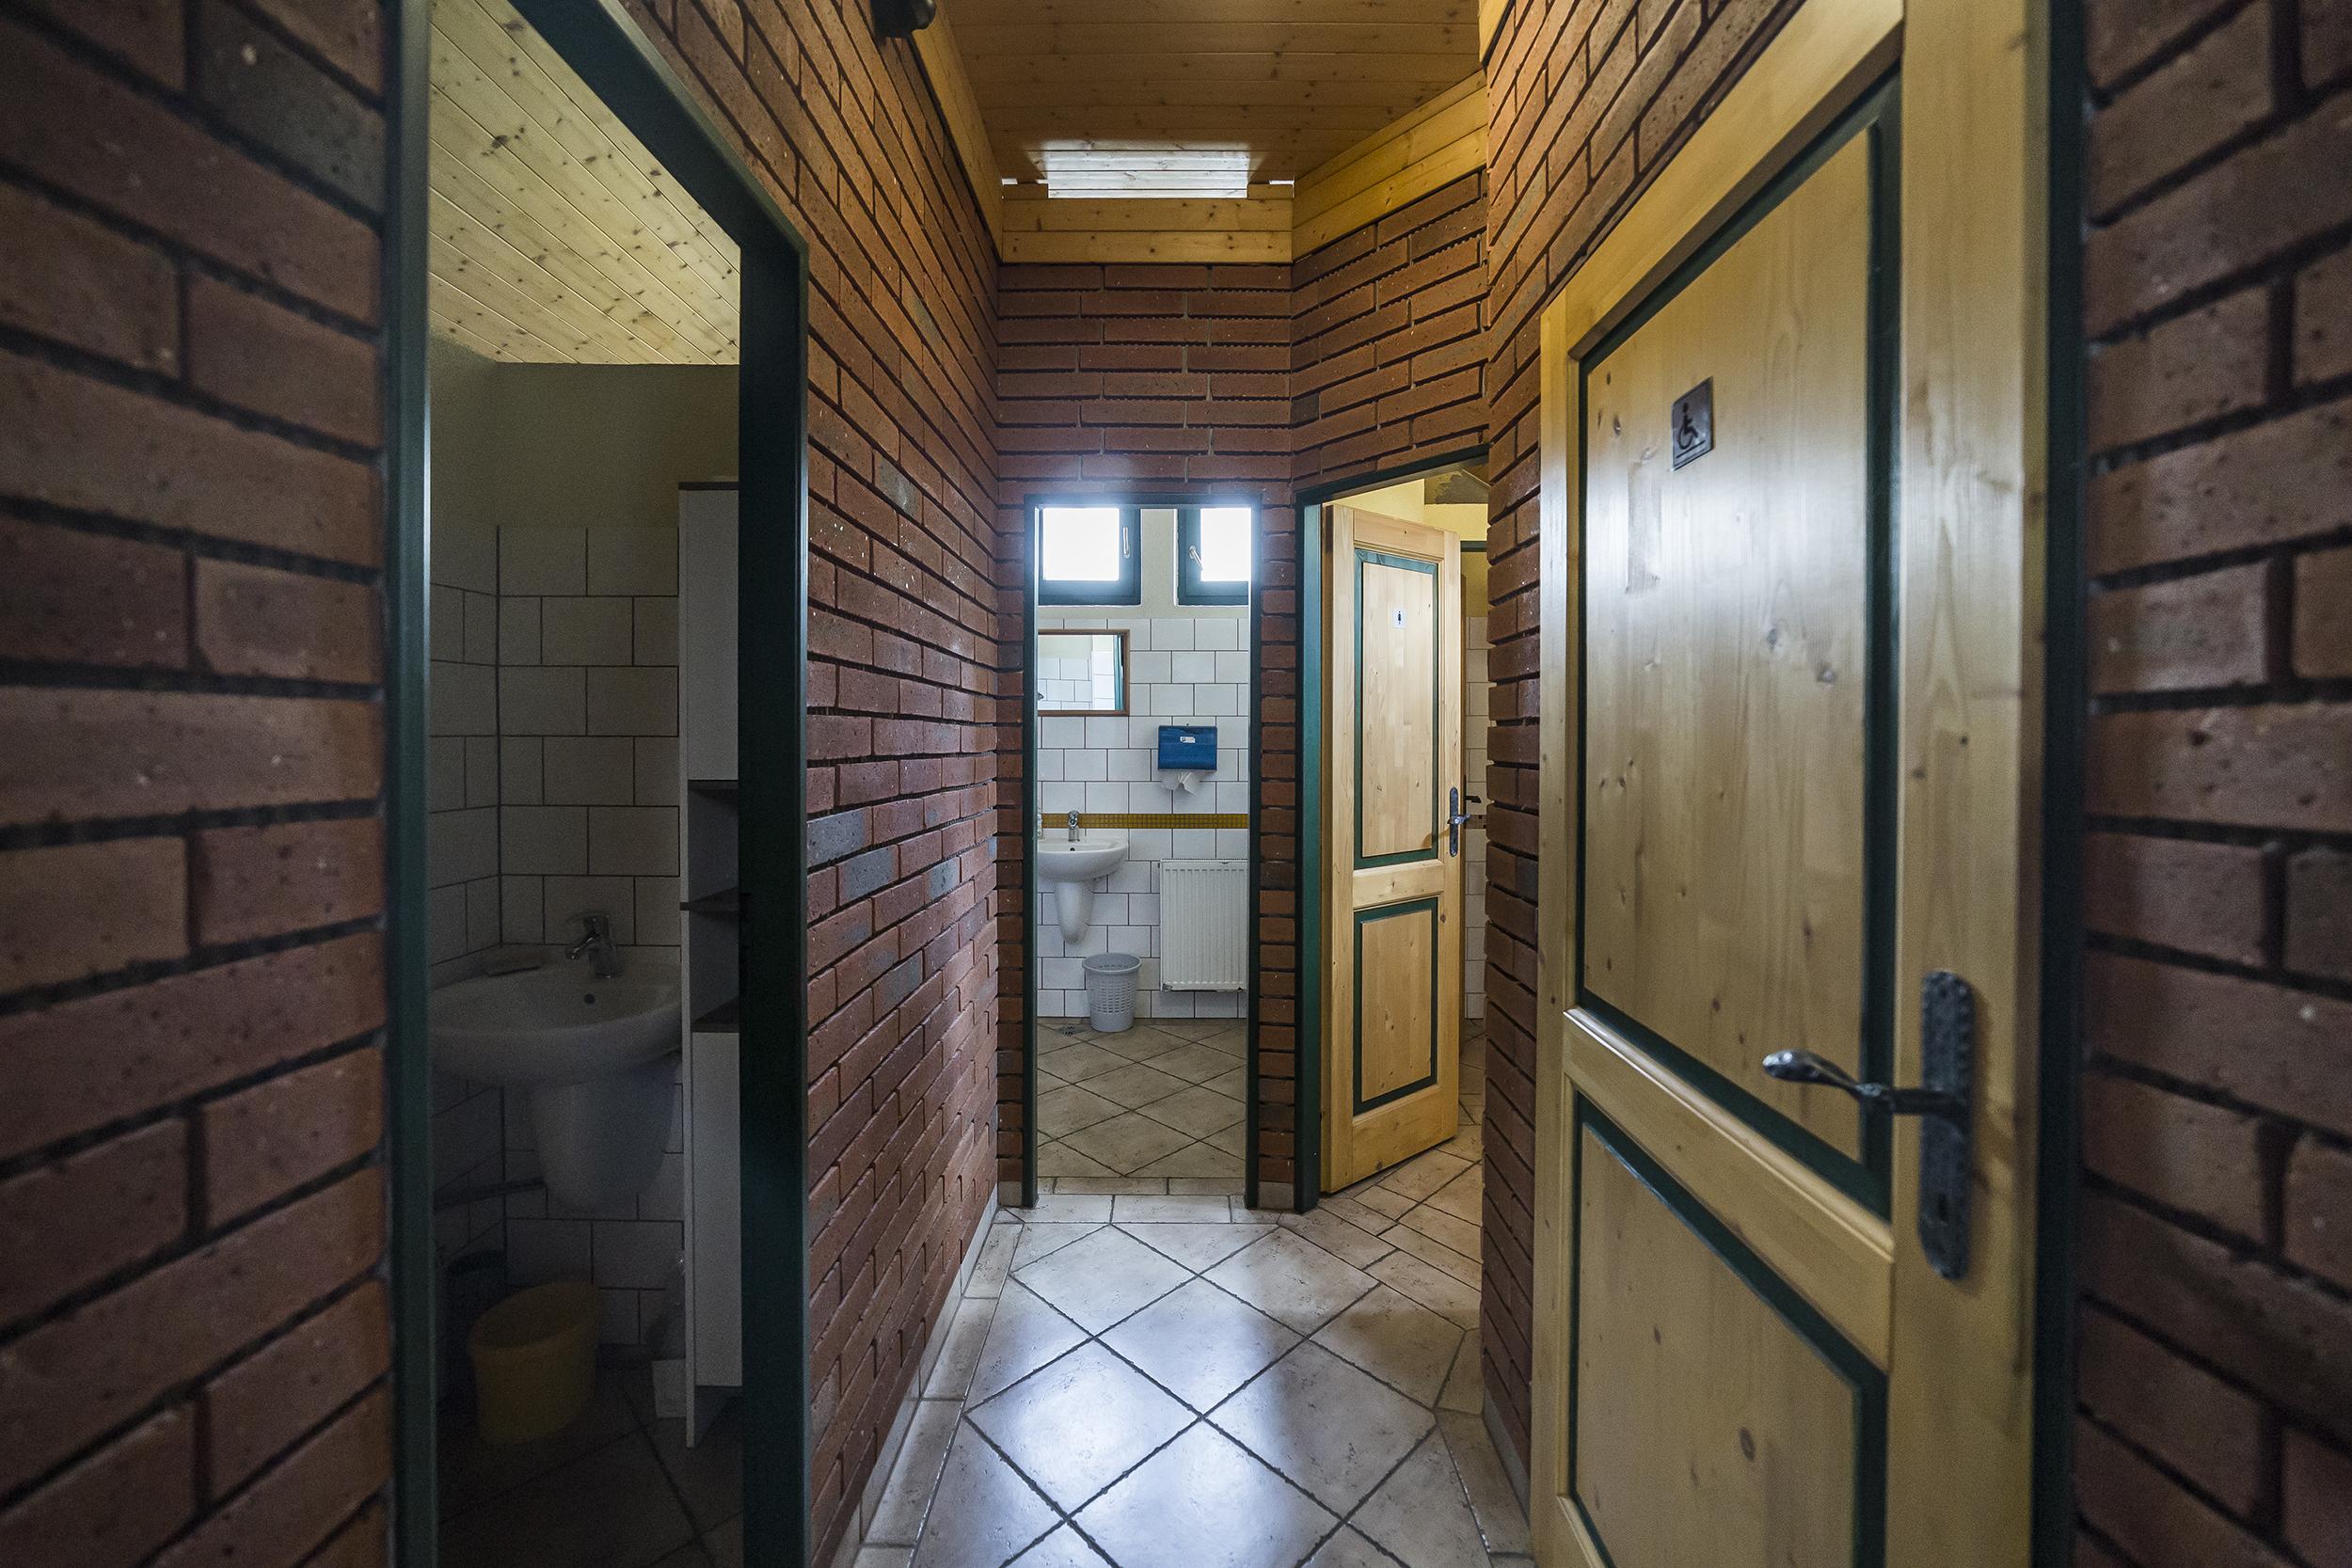 dvere zachod wc toaleta umyvadlo okno klika linda bittova prodej domu radun